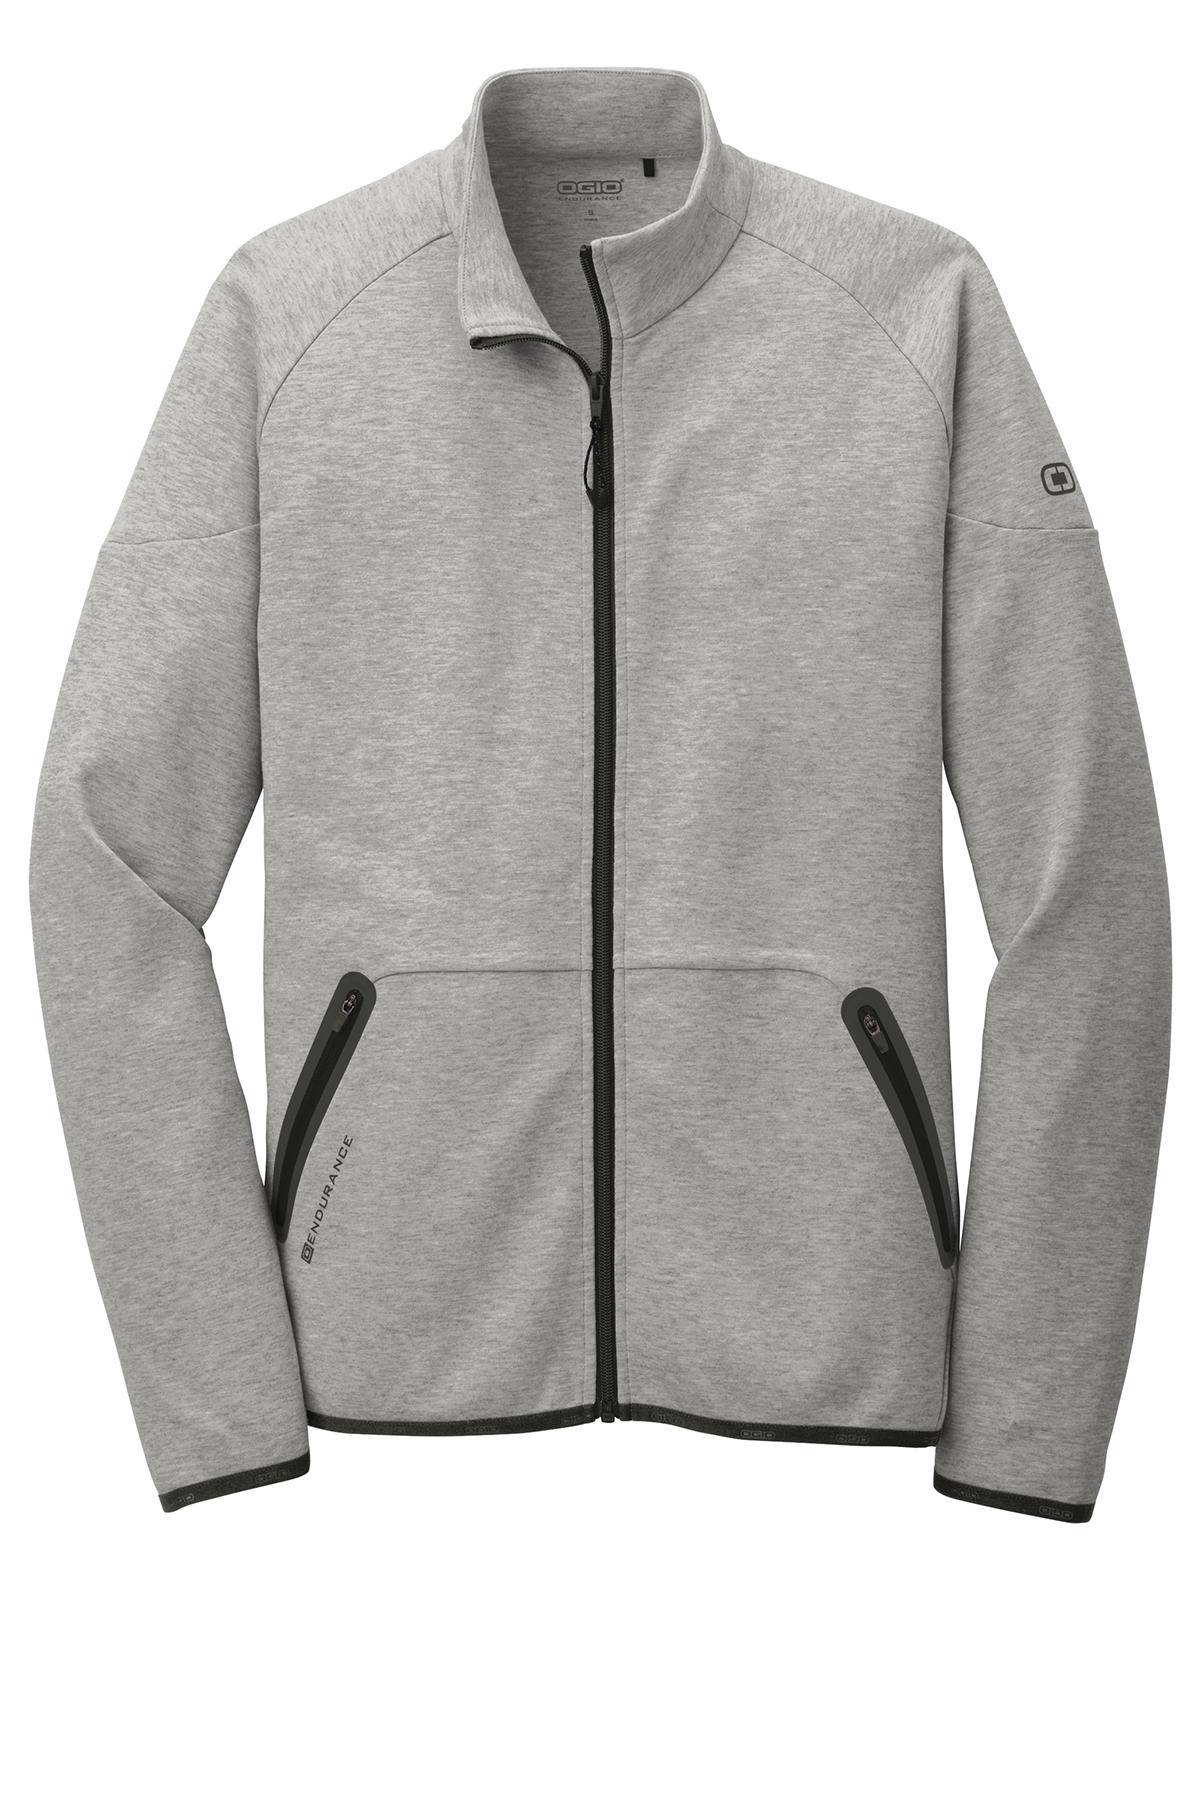 Ogio 174 Endurance Origin Jacket Performance Sweatshirts